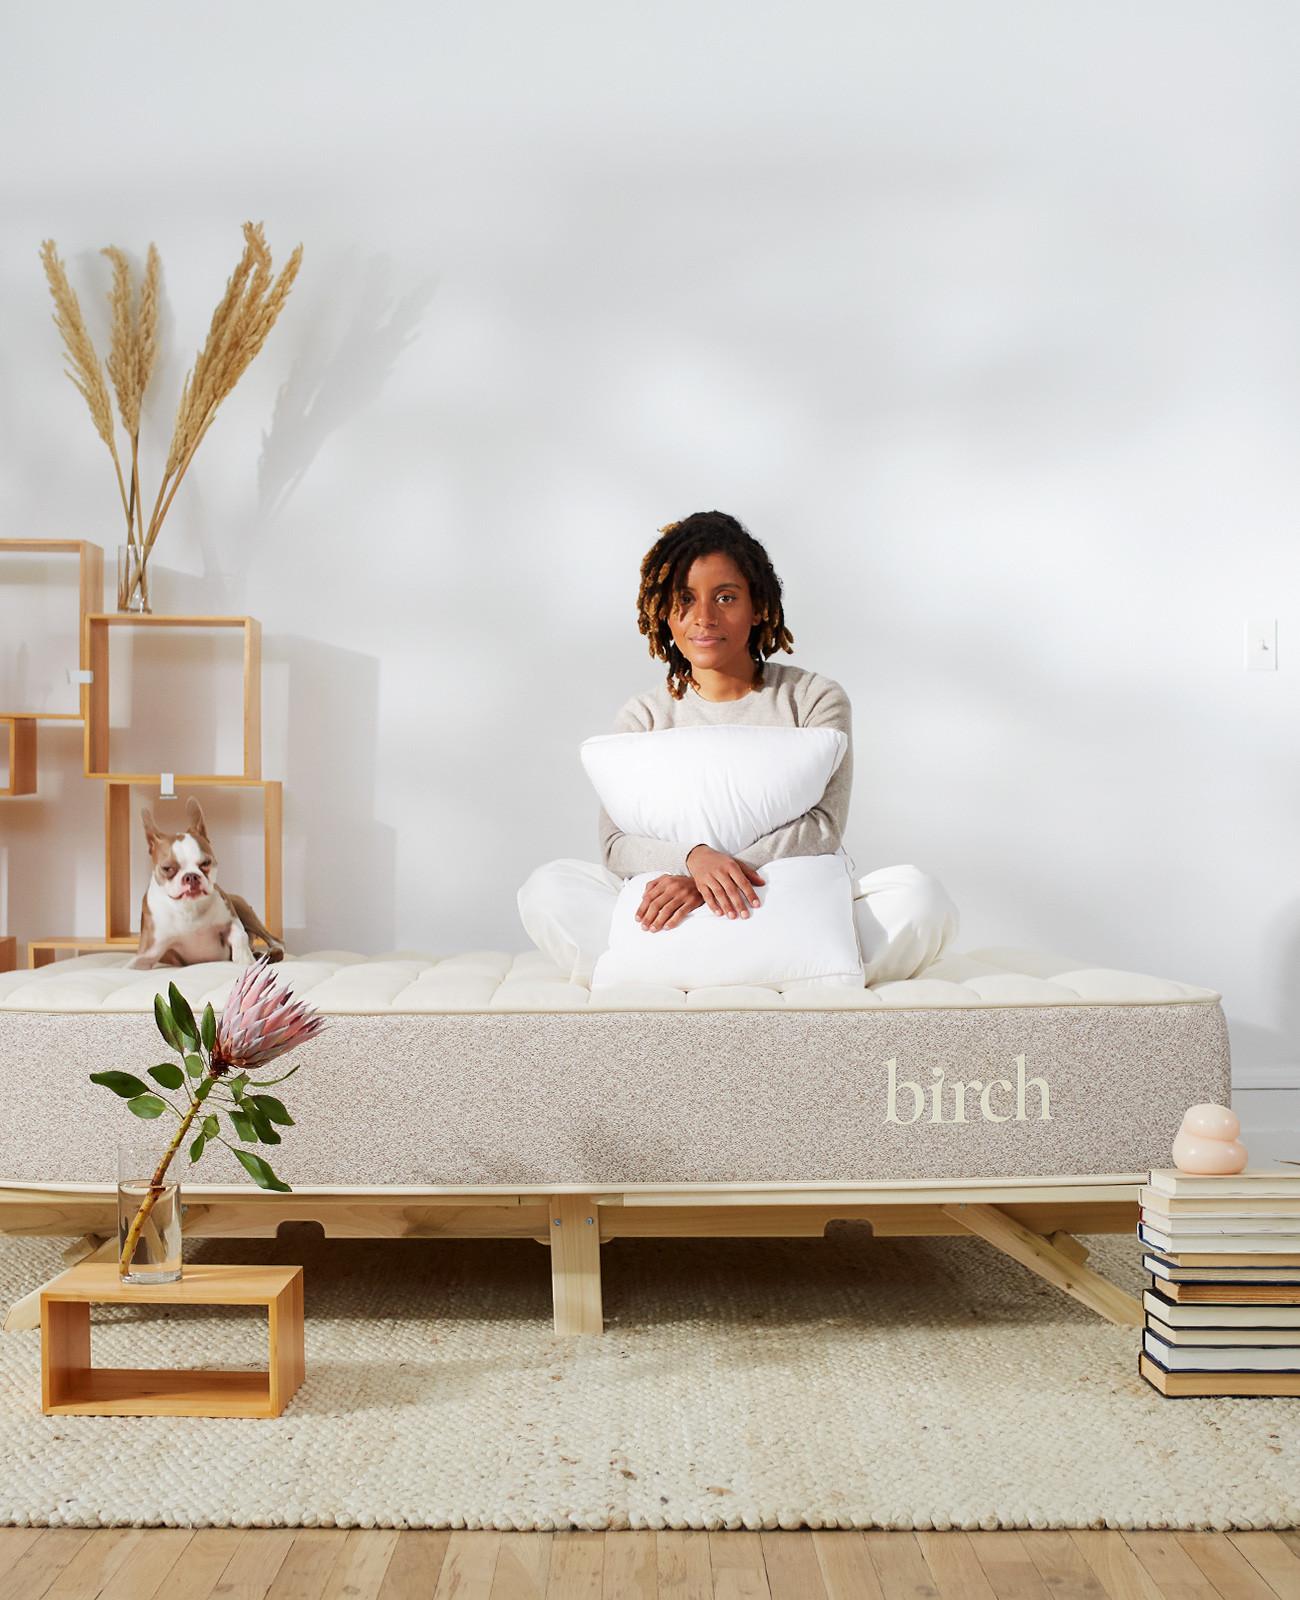 Birch by Helix mattress sale